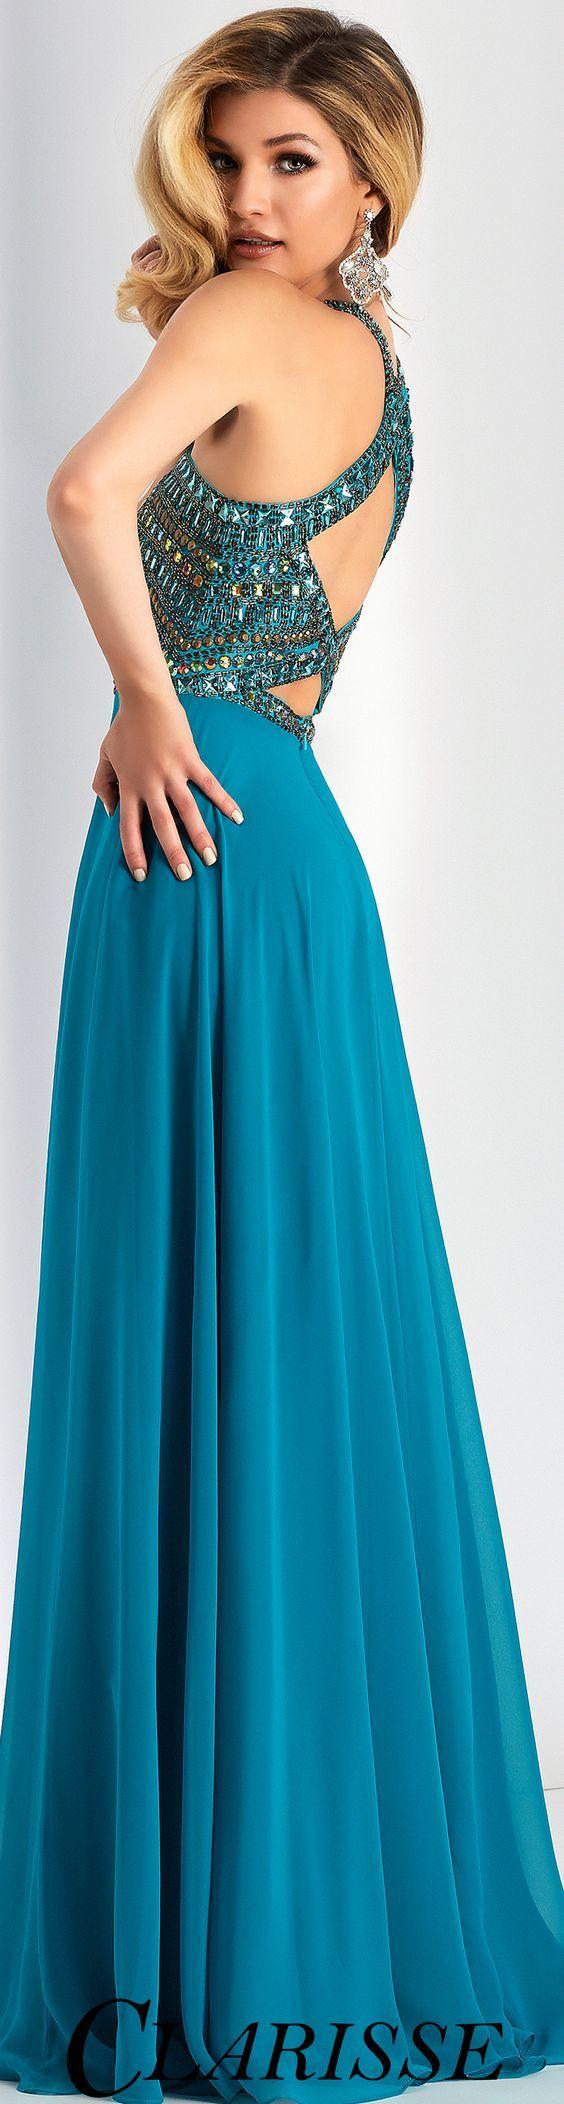 263 best prom dress images on Pinterest | Prom dresses, Ball dresses ...